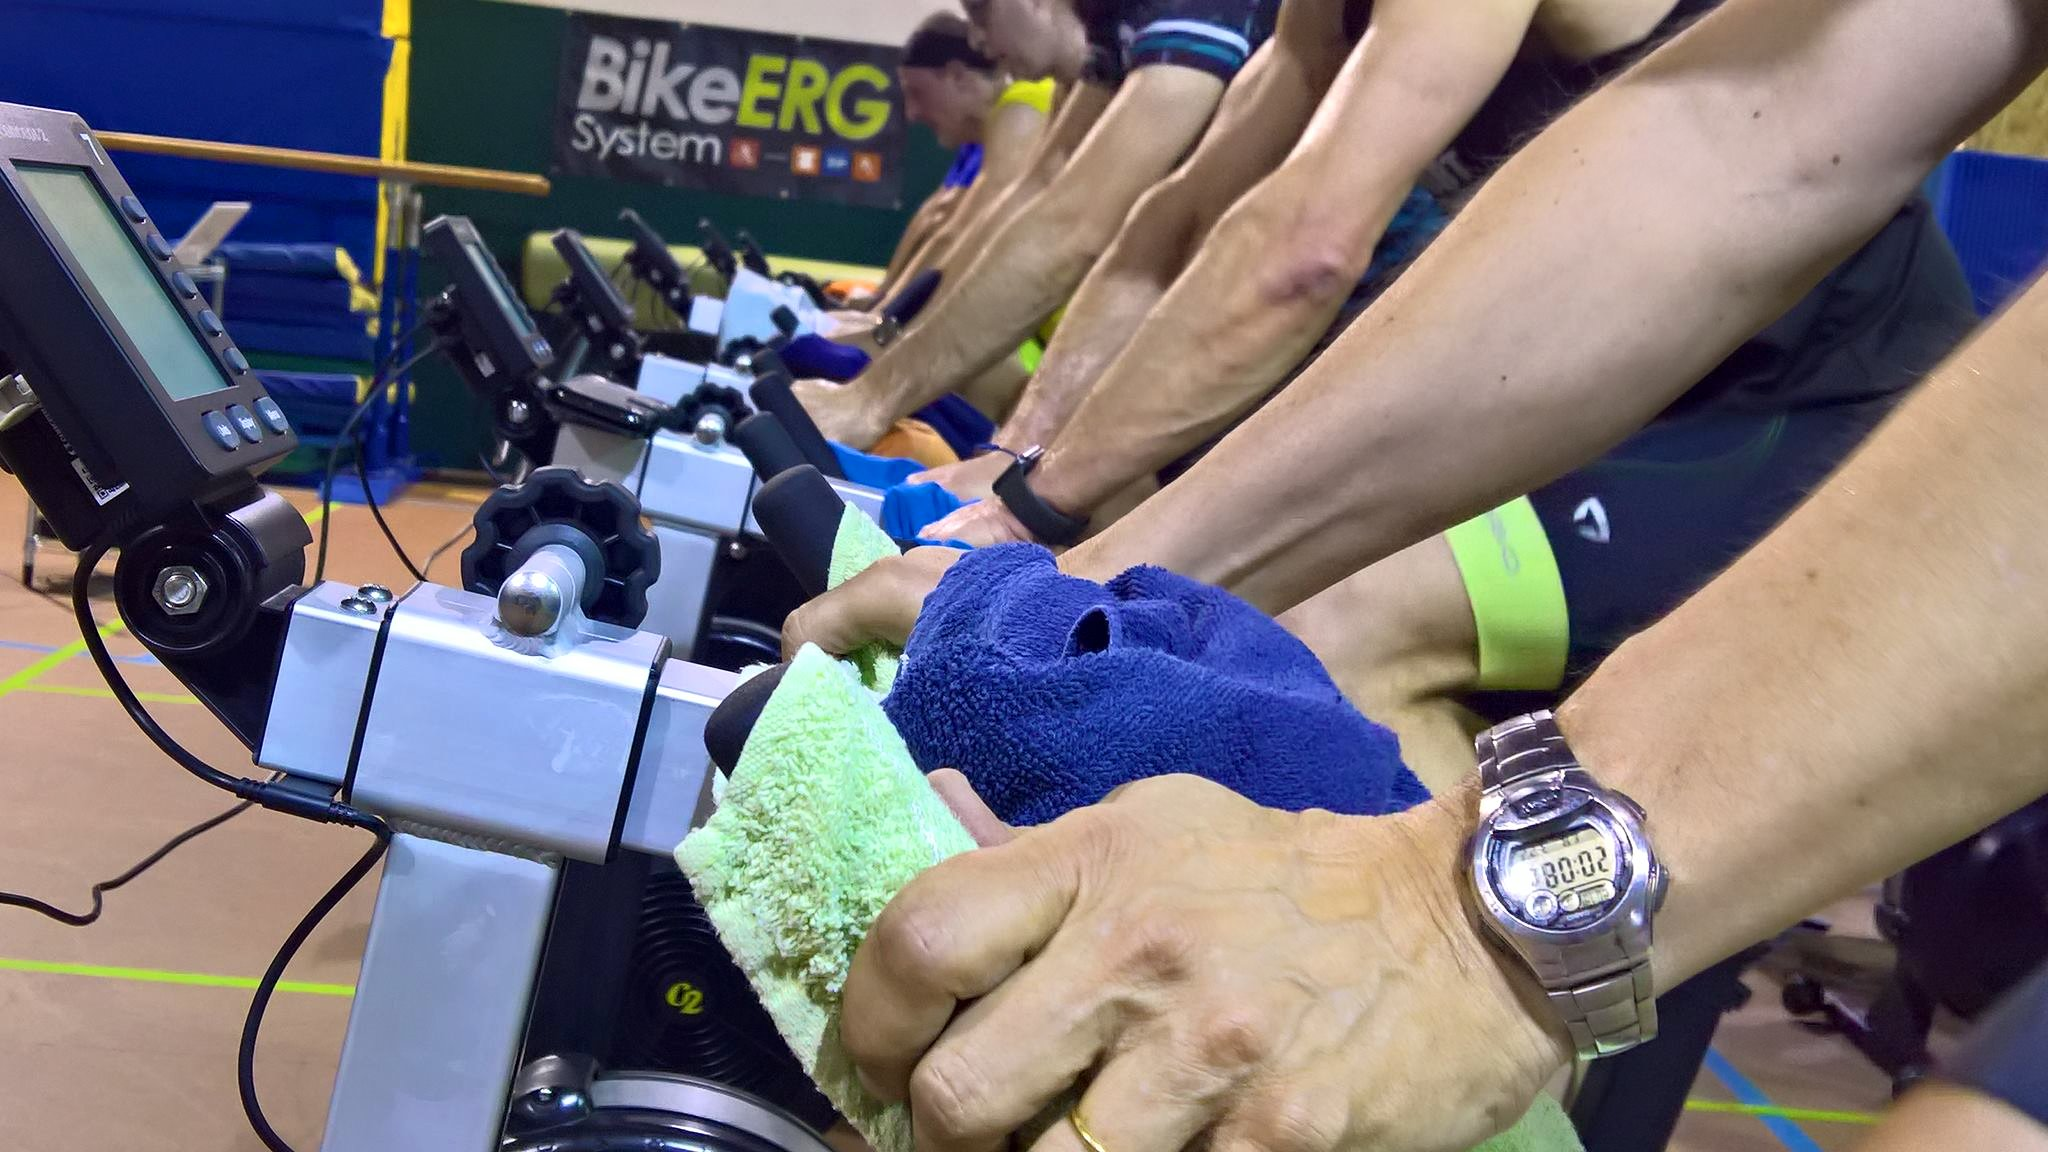 corso BikeErg in palestra a Trento | Prosport a.s.d. Trento